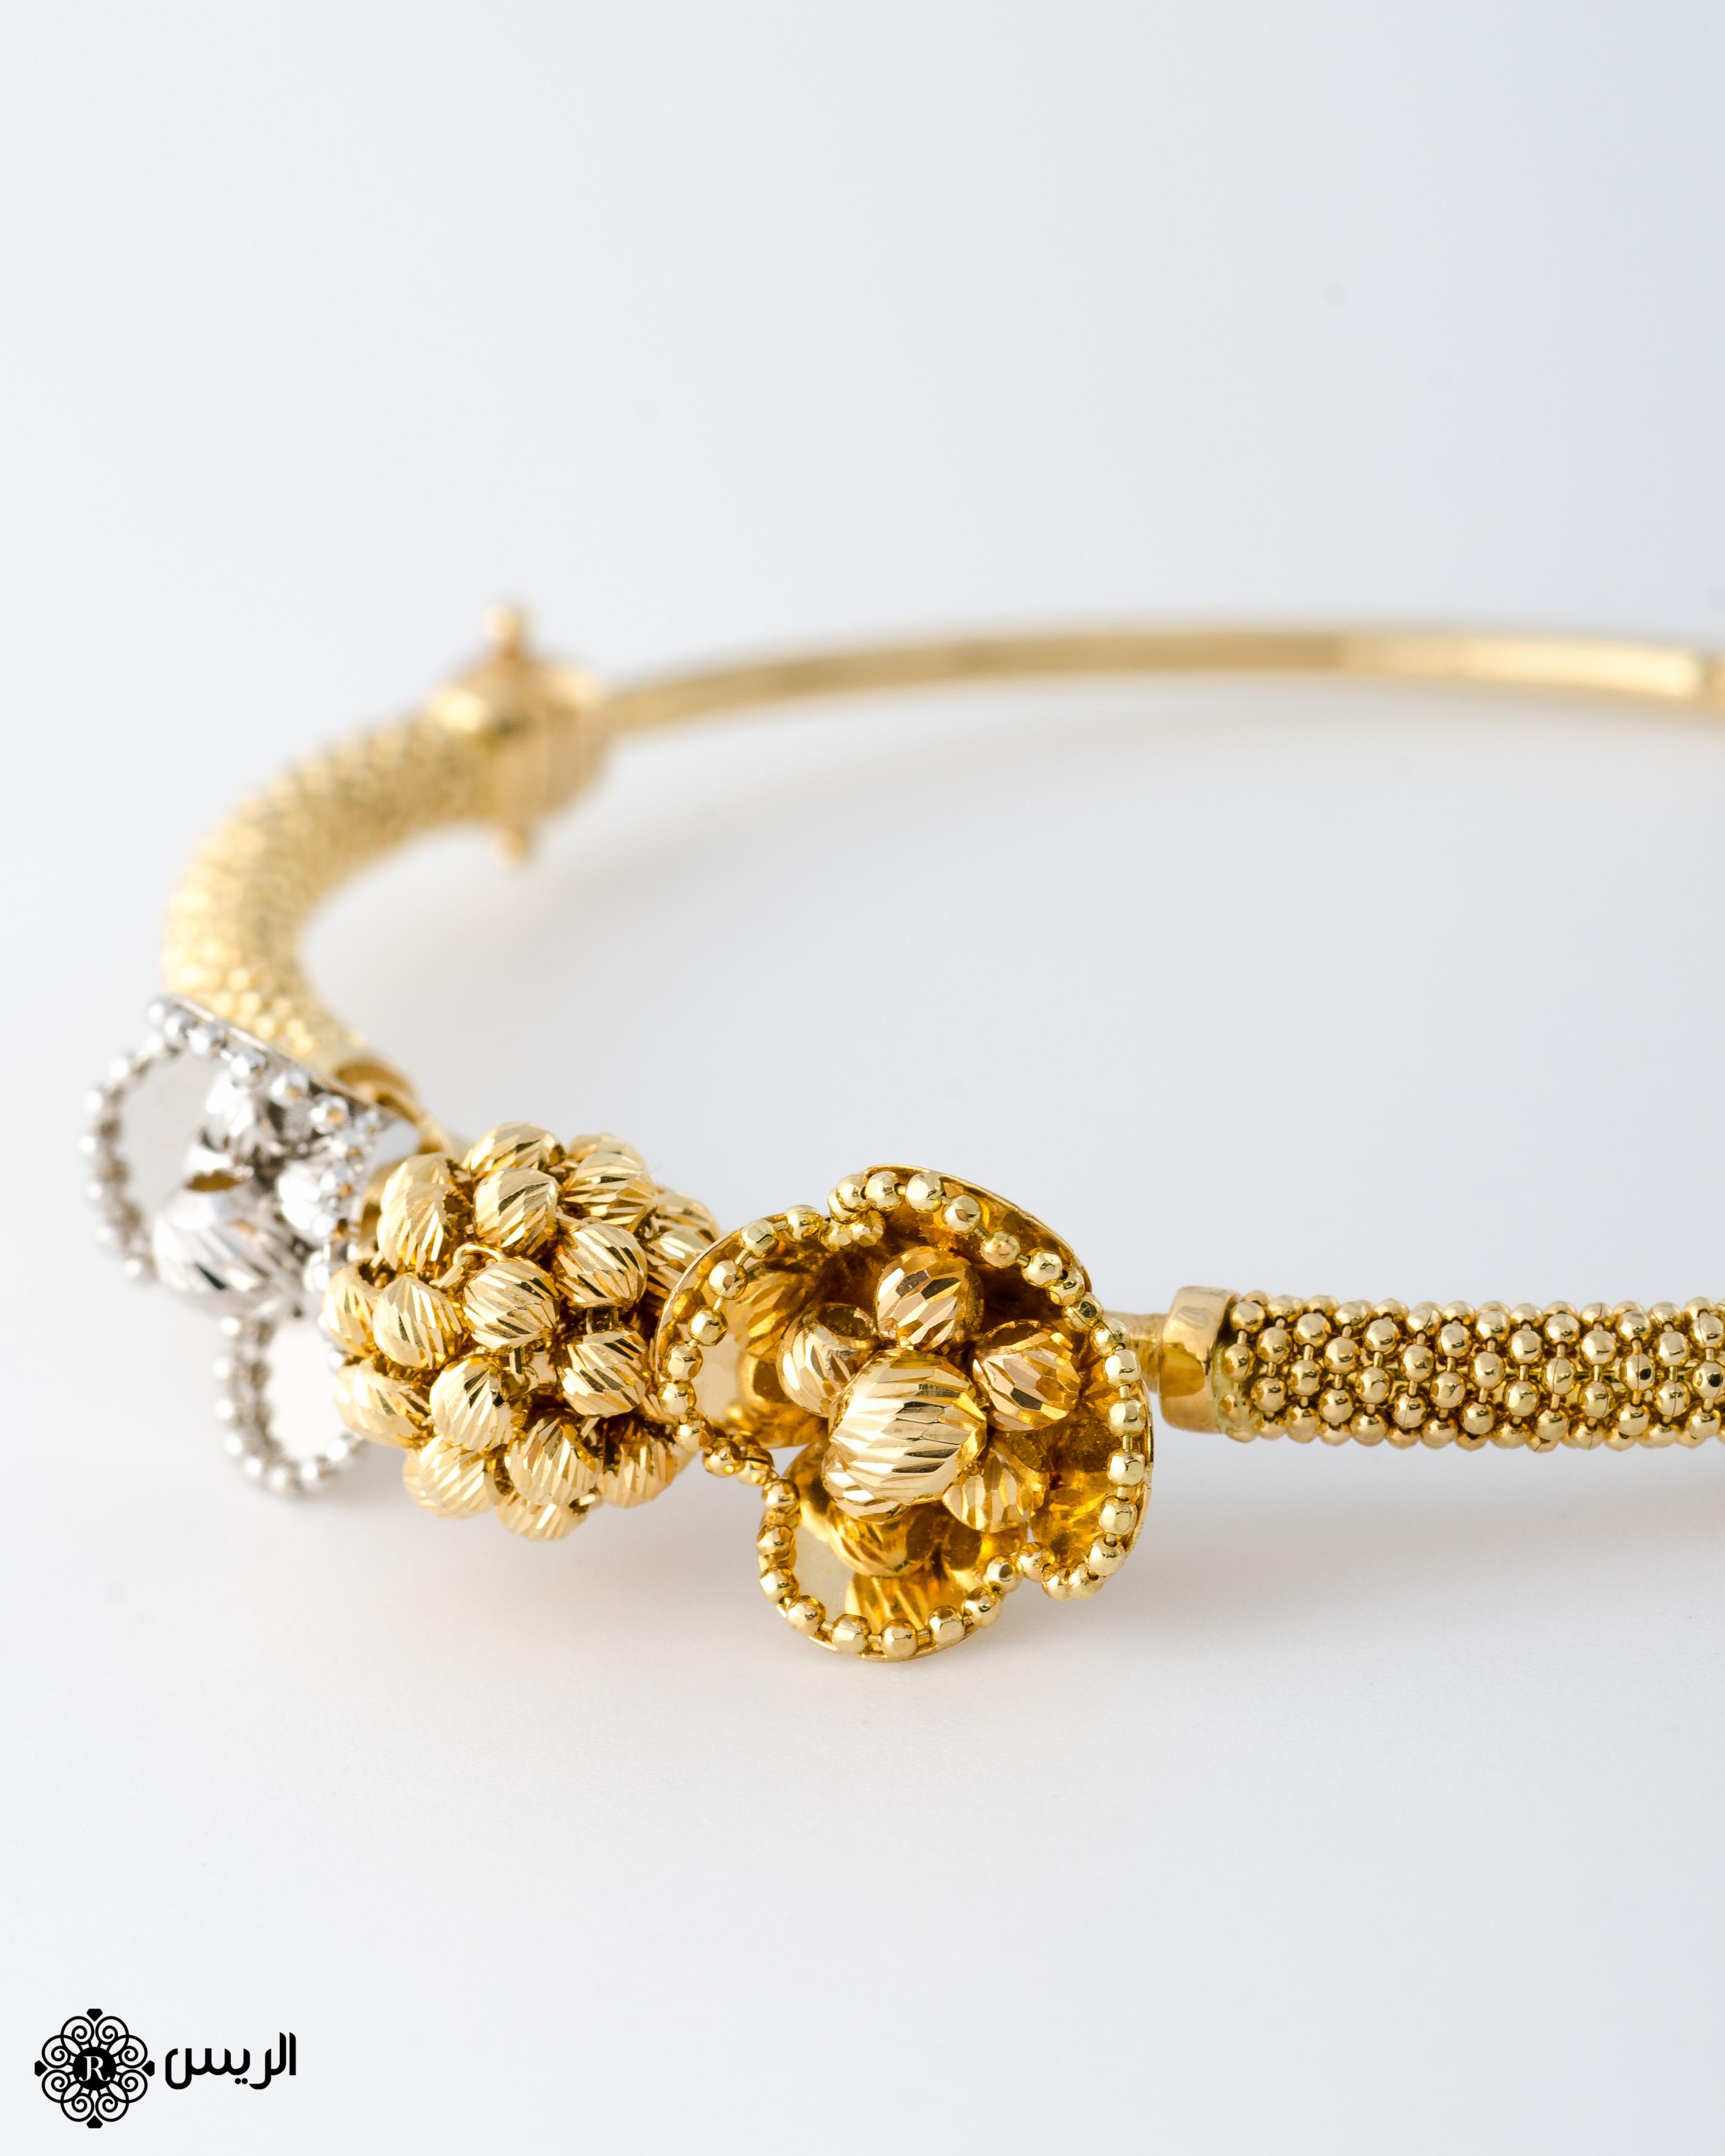 Raies jewelry Bangle Jessica Italian Design إسورة جيسيكا تصميم إيطالي الريس للمجوهرات